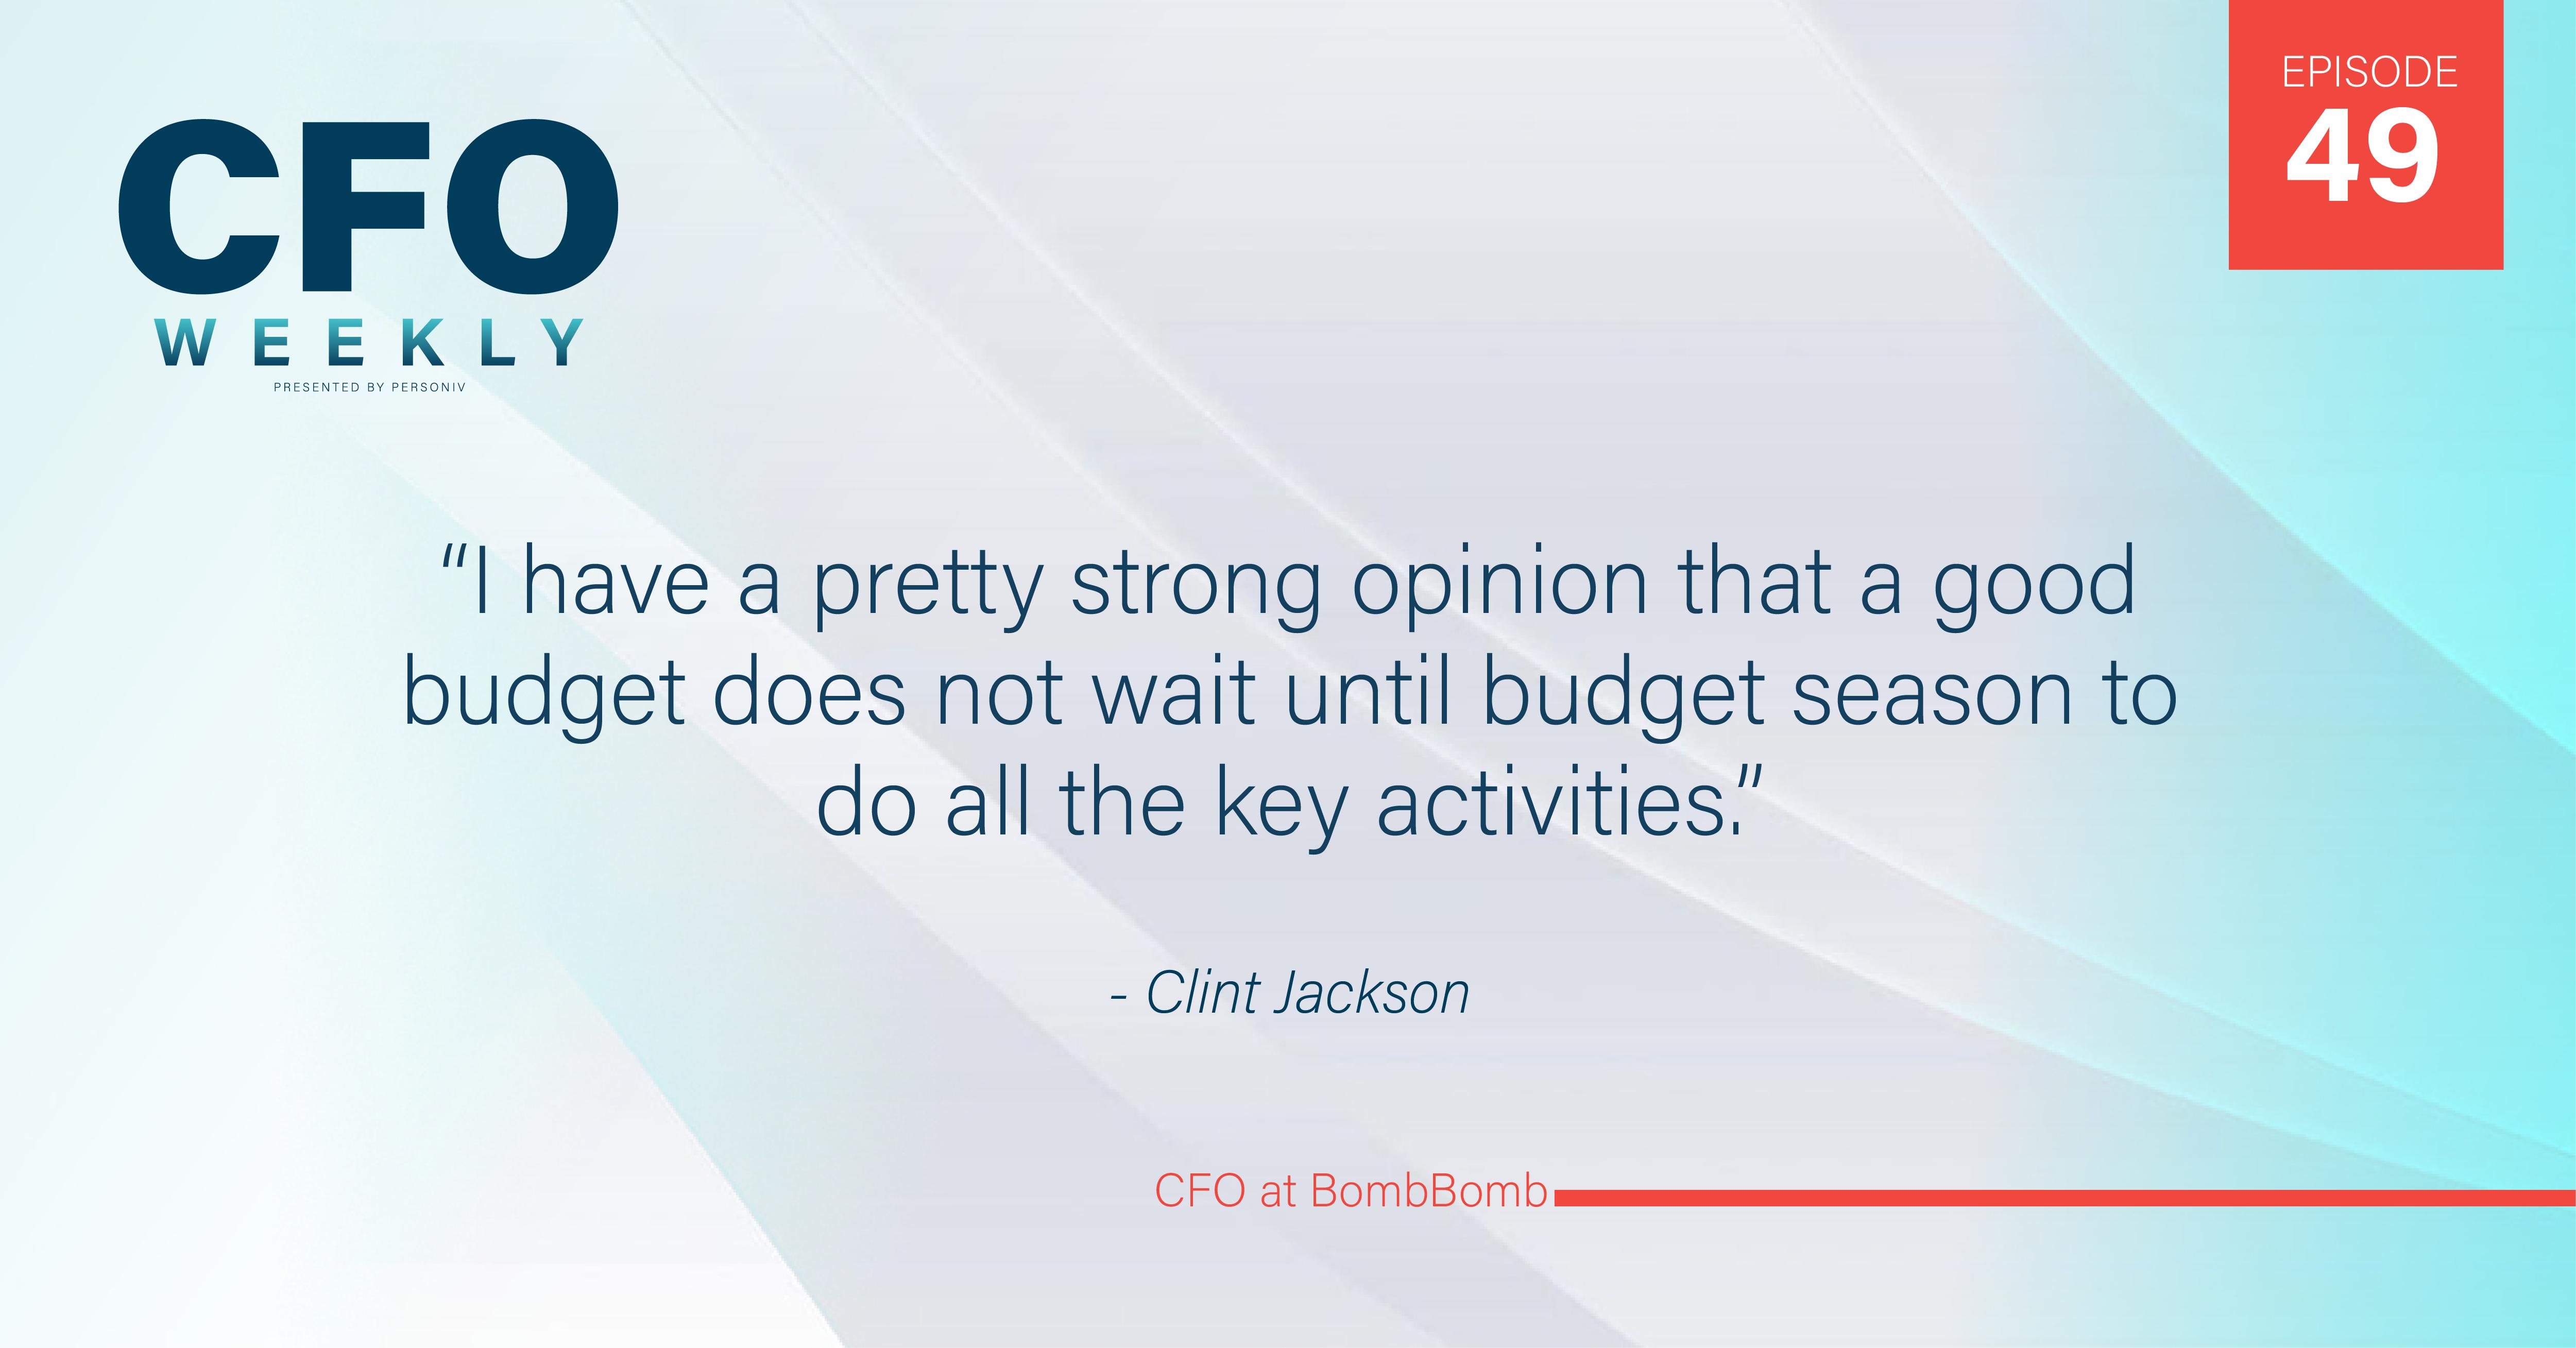 Clint Jackson, CFO